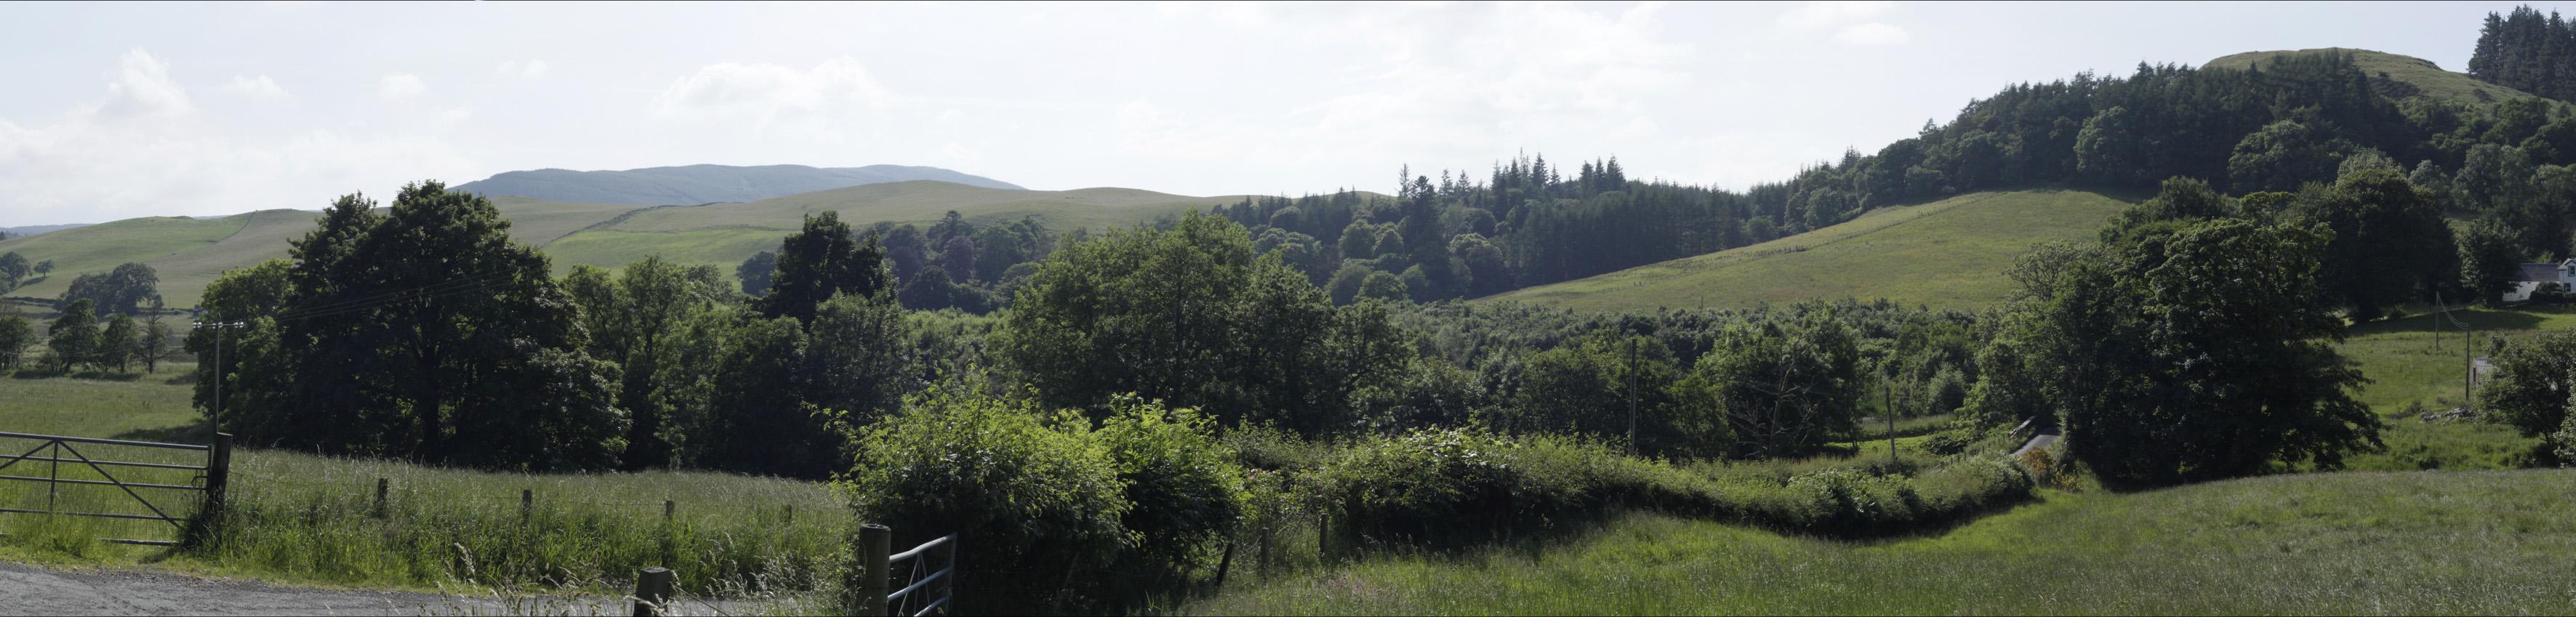 The unspoilt Girvan Valley near Straiton